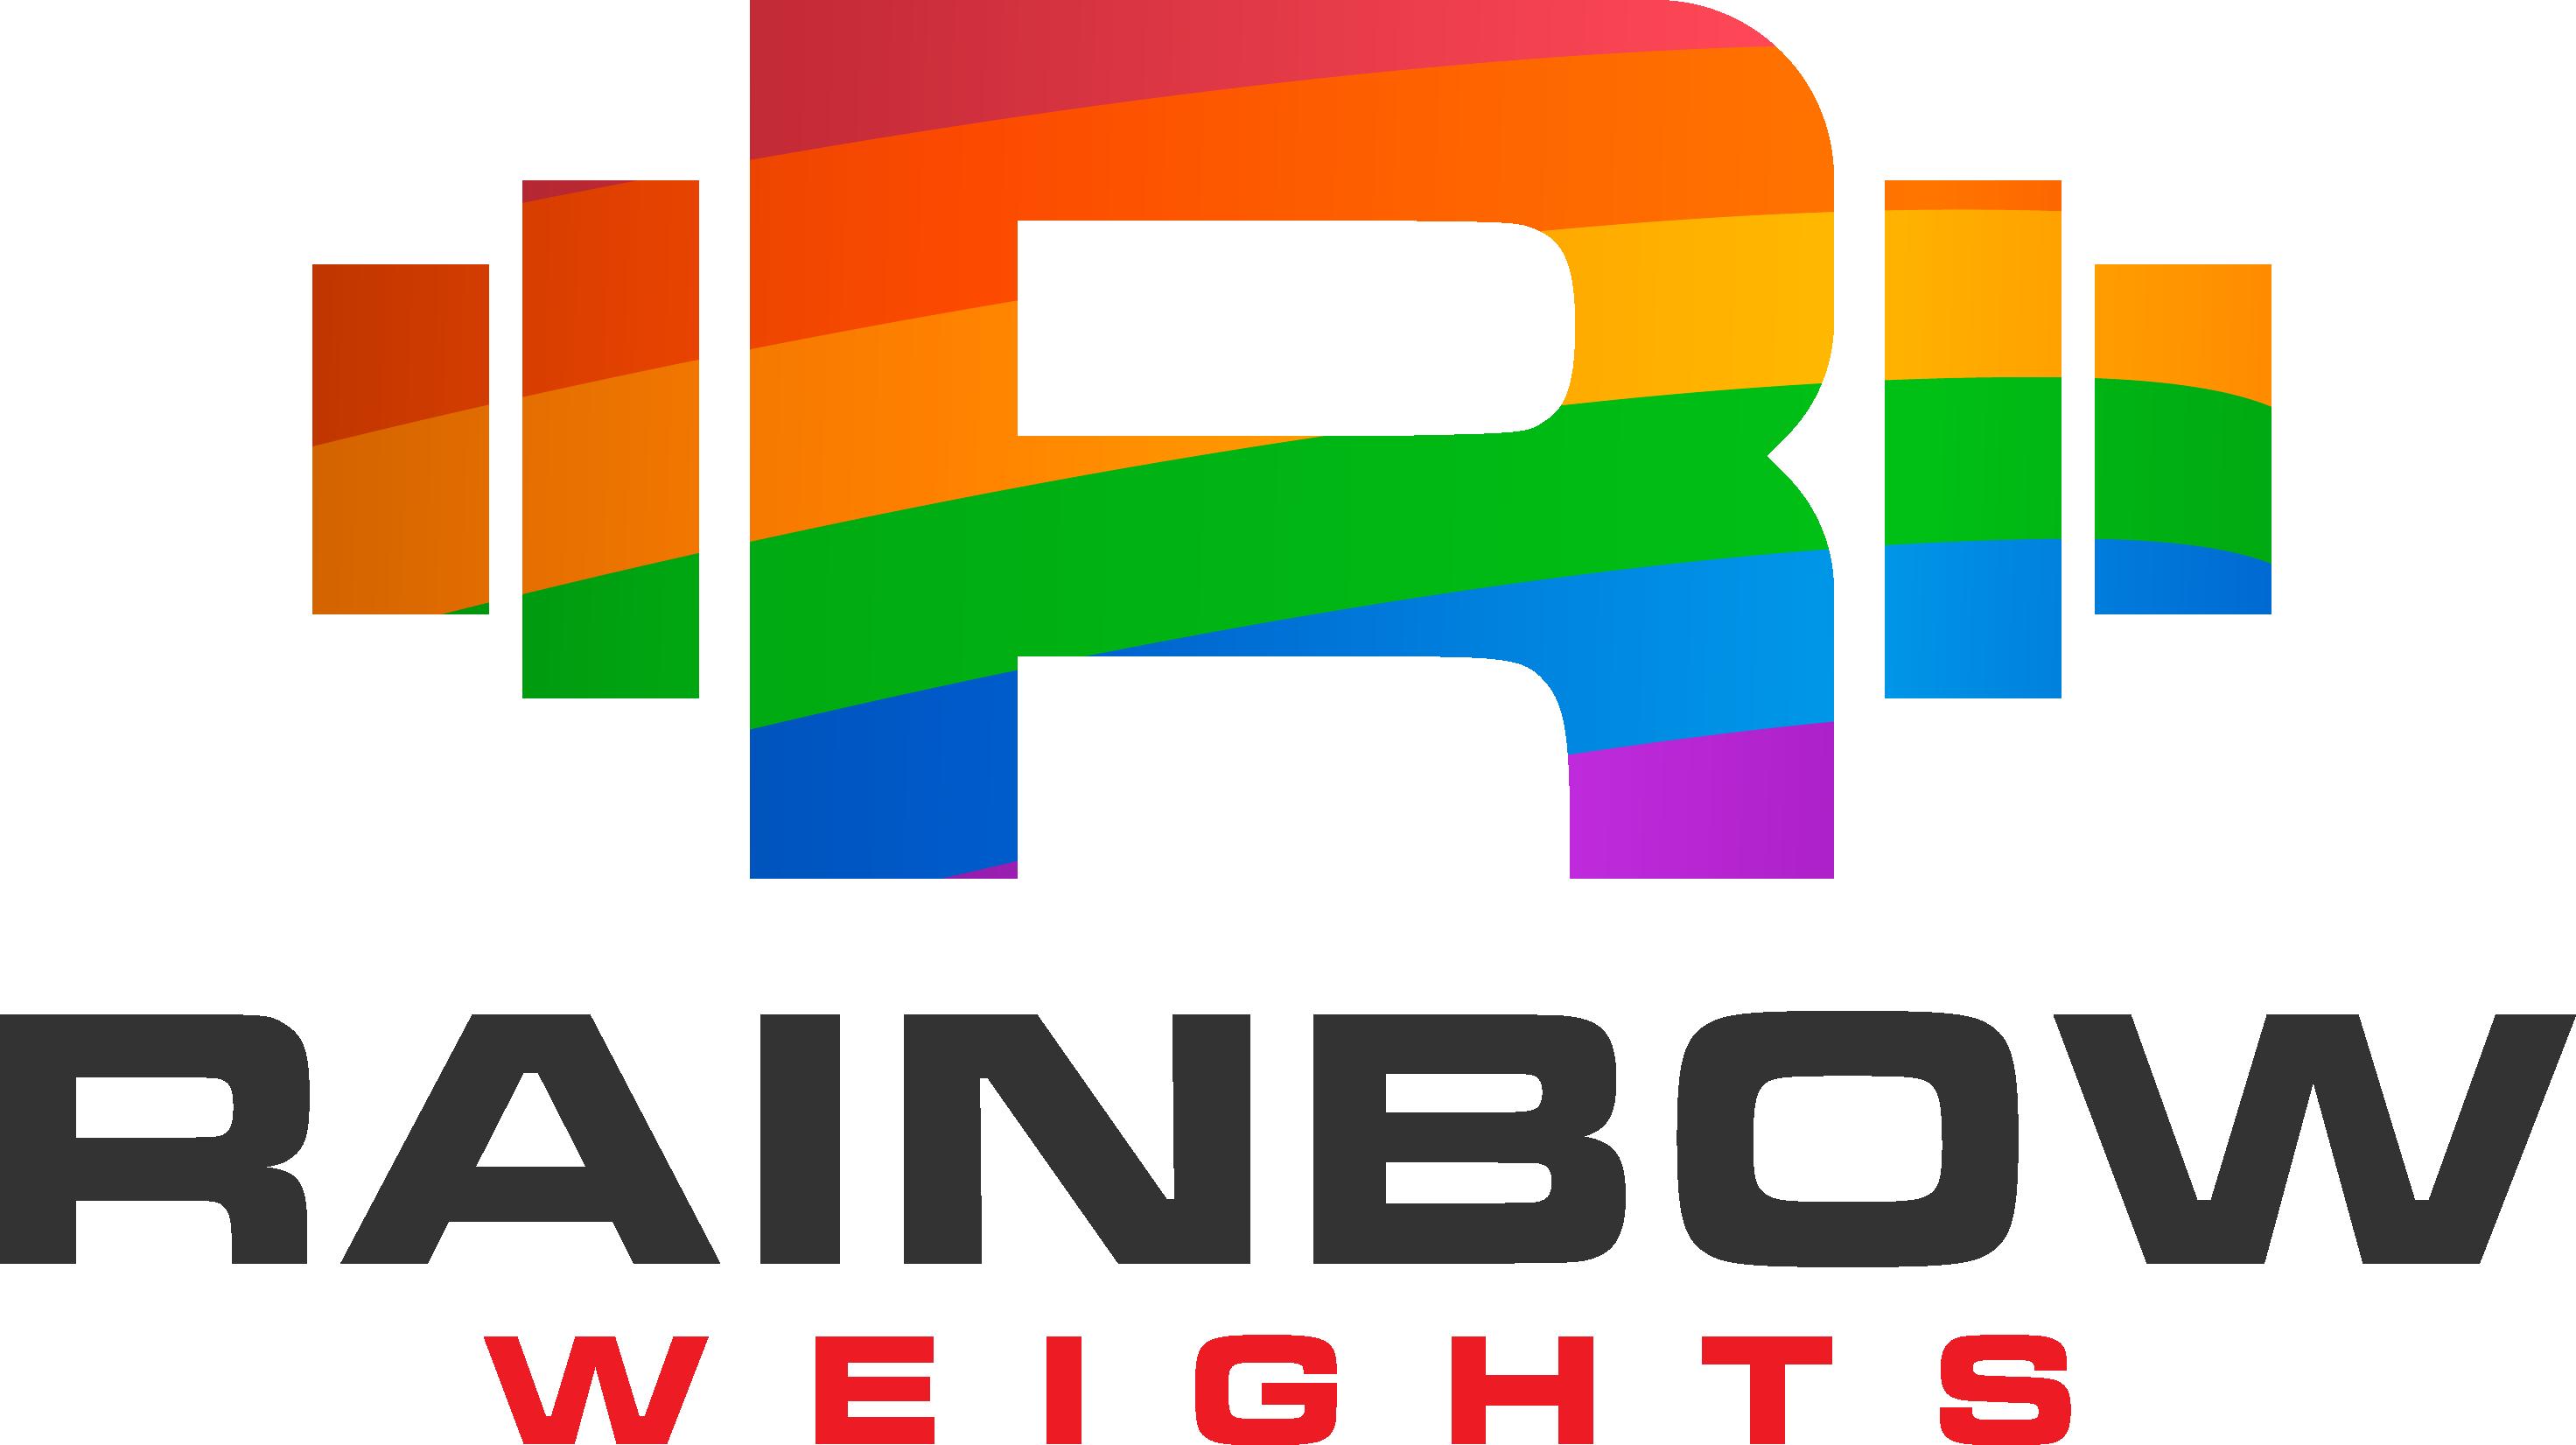 rainbowweights